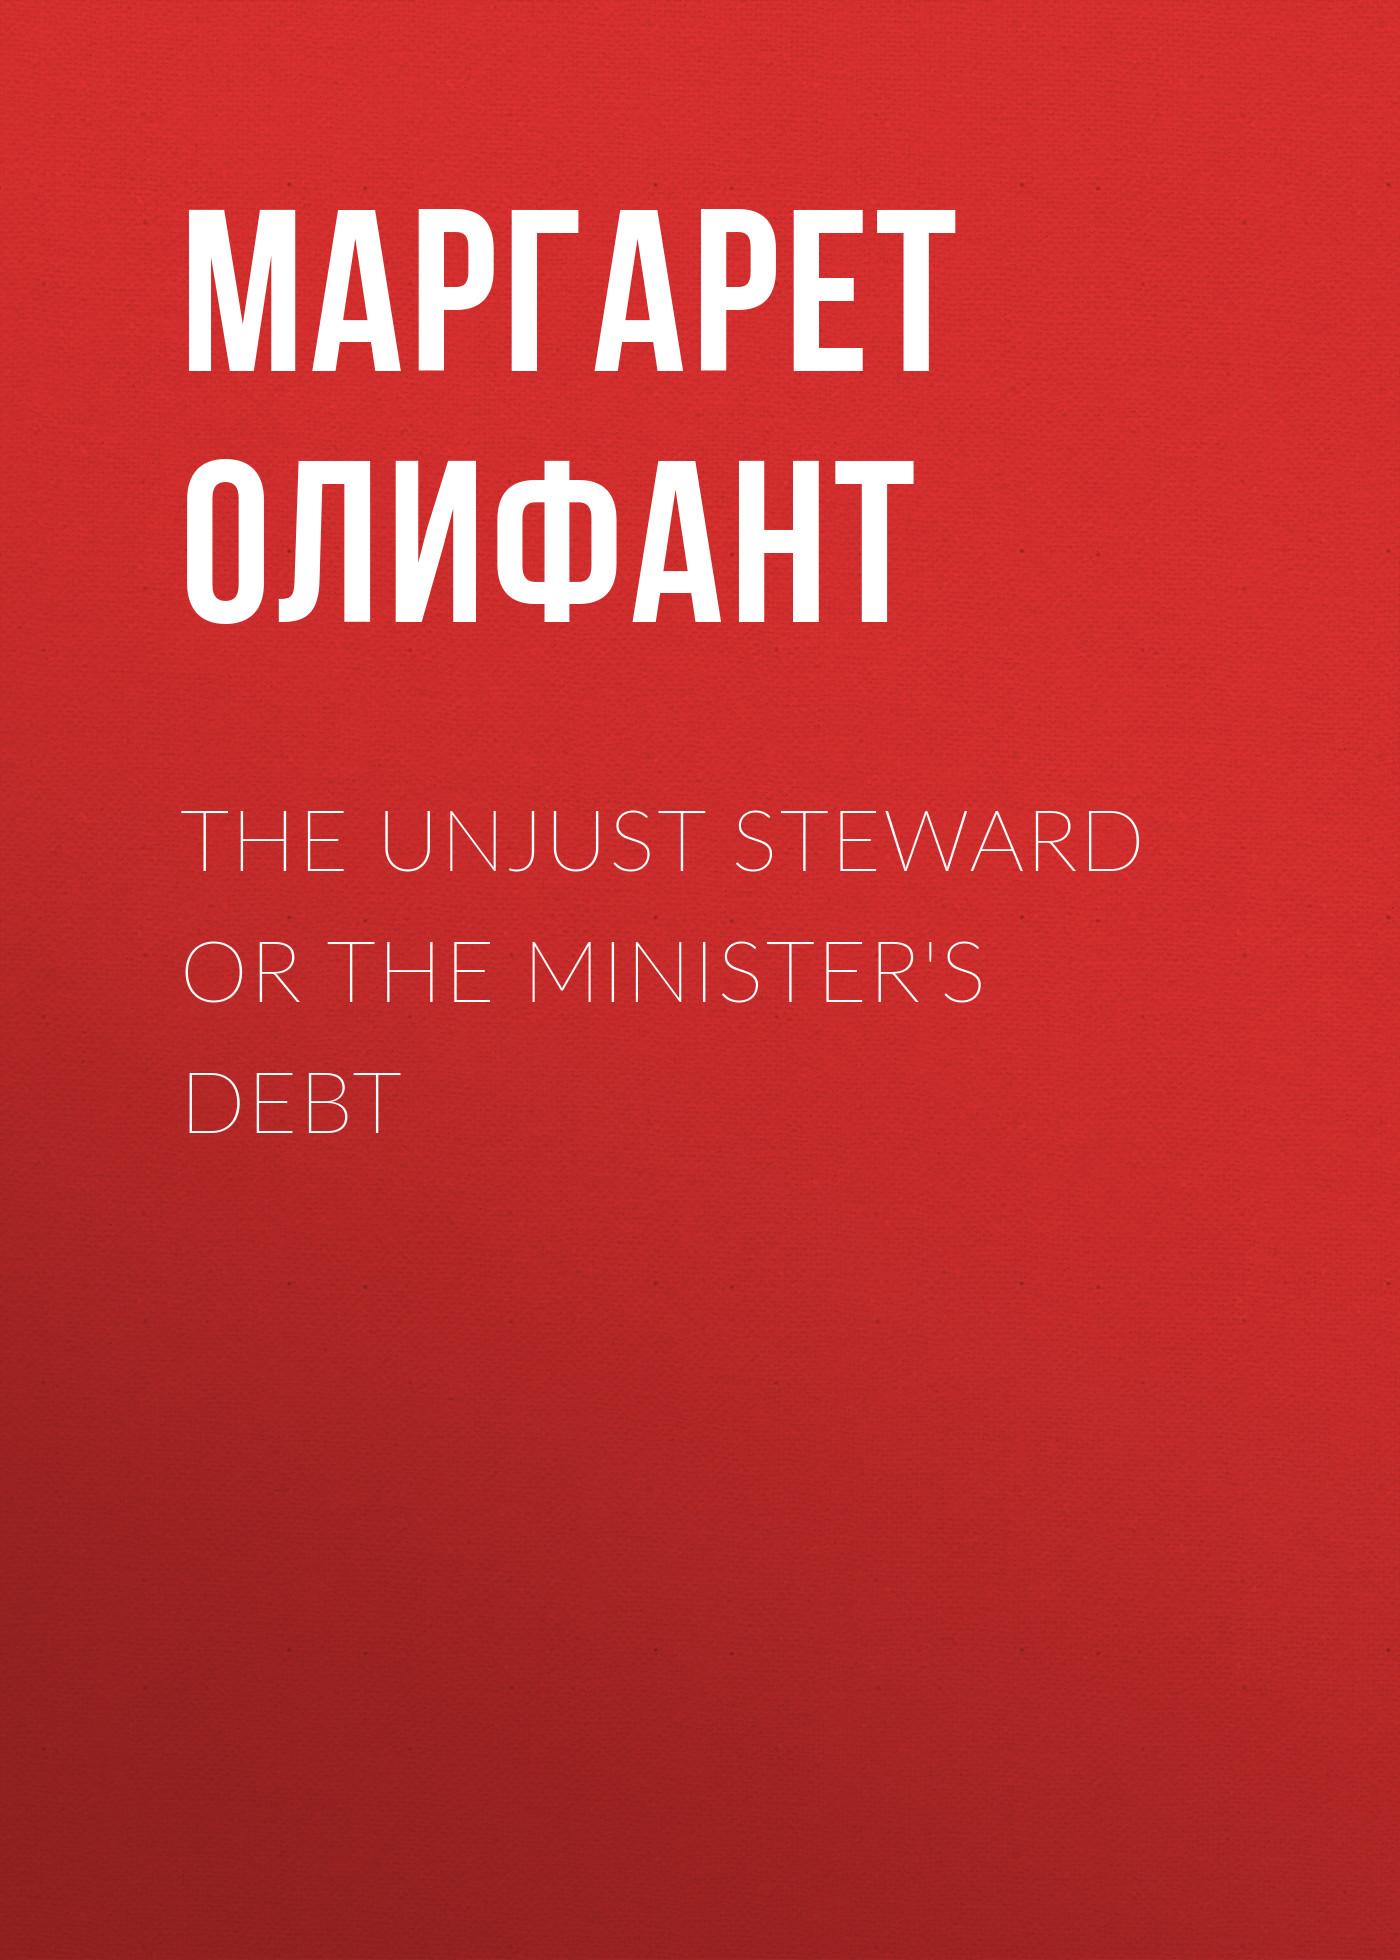 Маргарет Олифант The Unjust Steward or The Minister's Debt sereno d clark the faithful steward